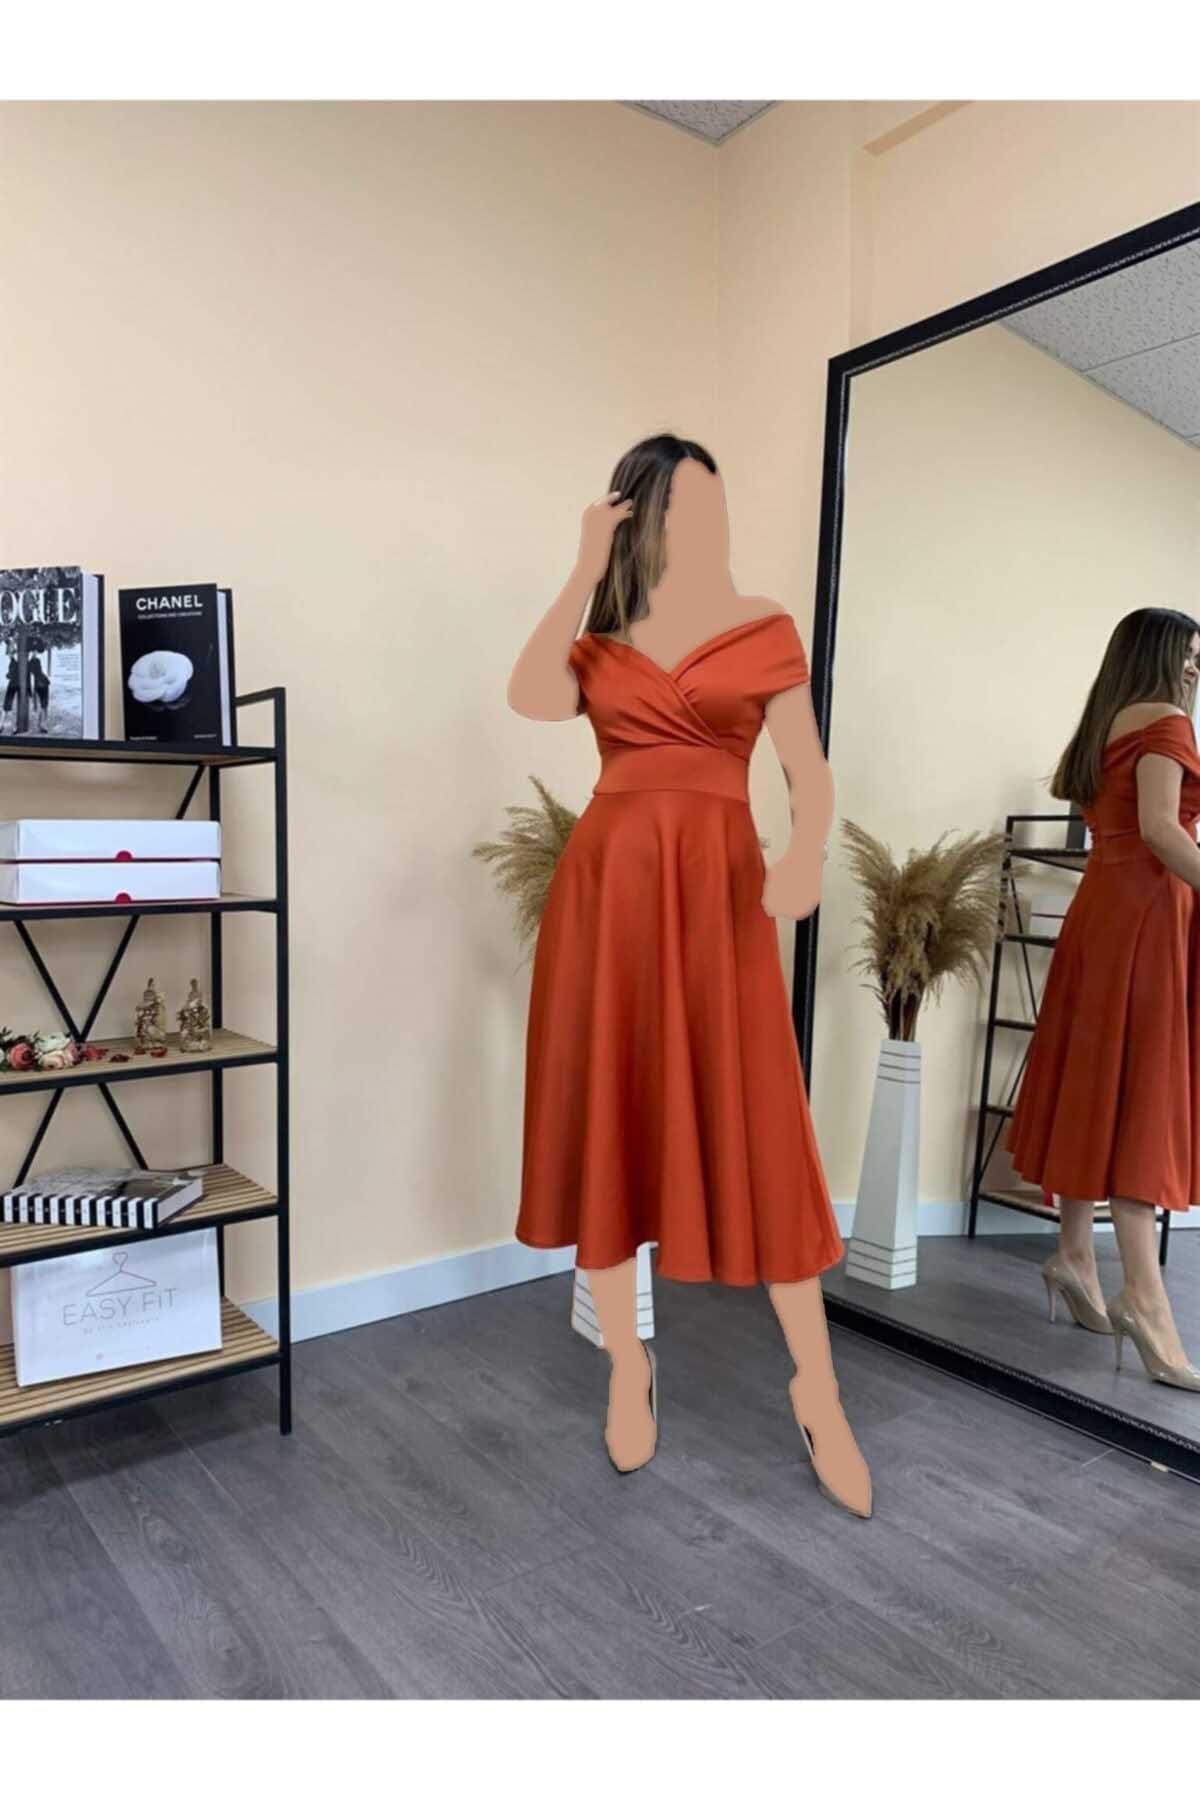 لباس مجلسی اورجینال برند giyimmasalı رنگ نارنجی کد ty122950174